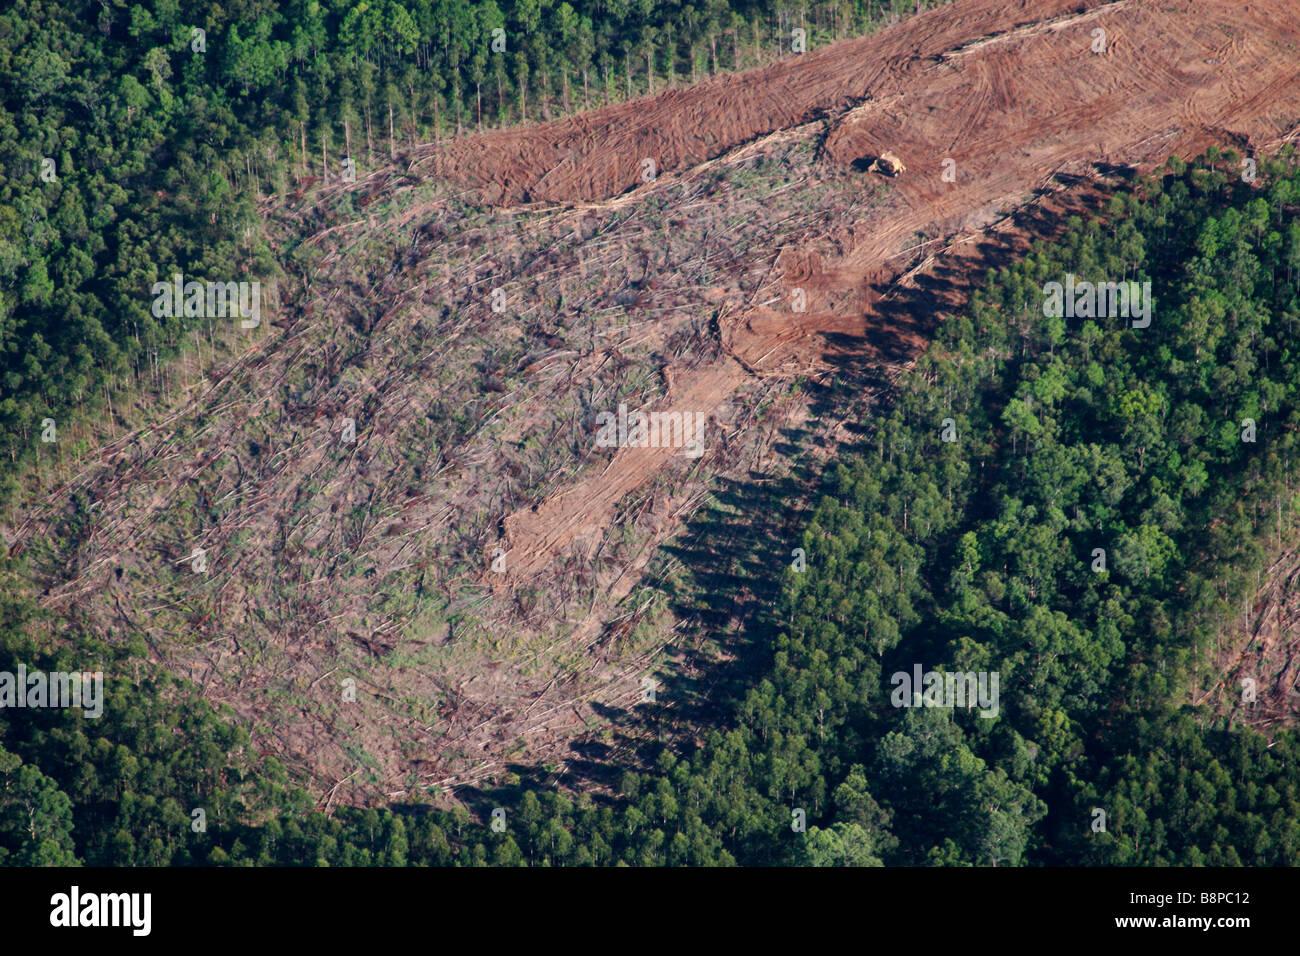 deforestación Imagen De Stock